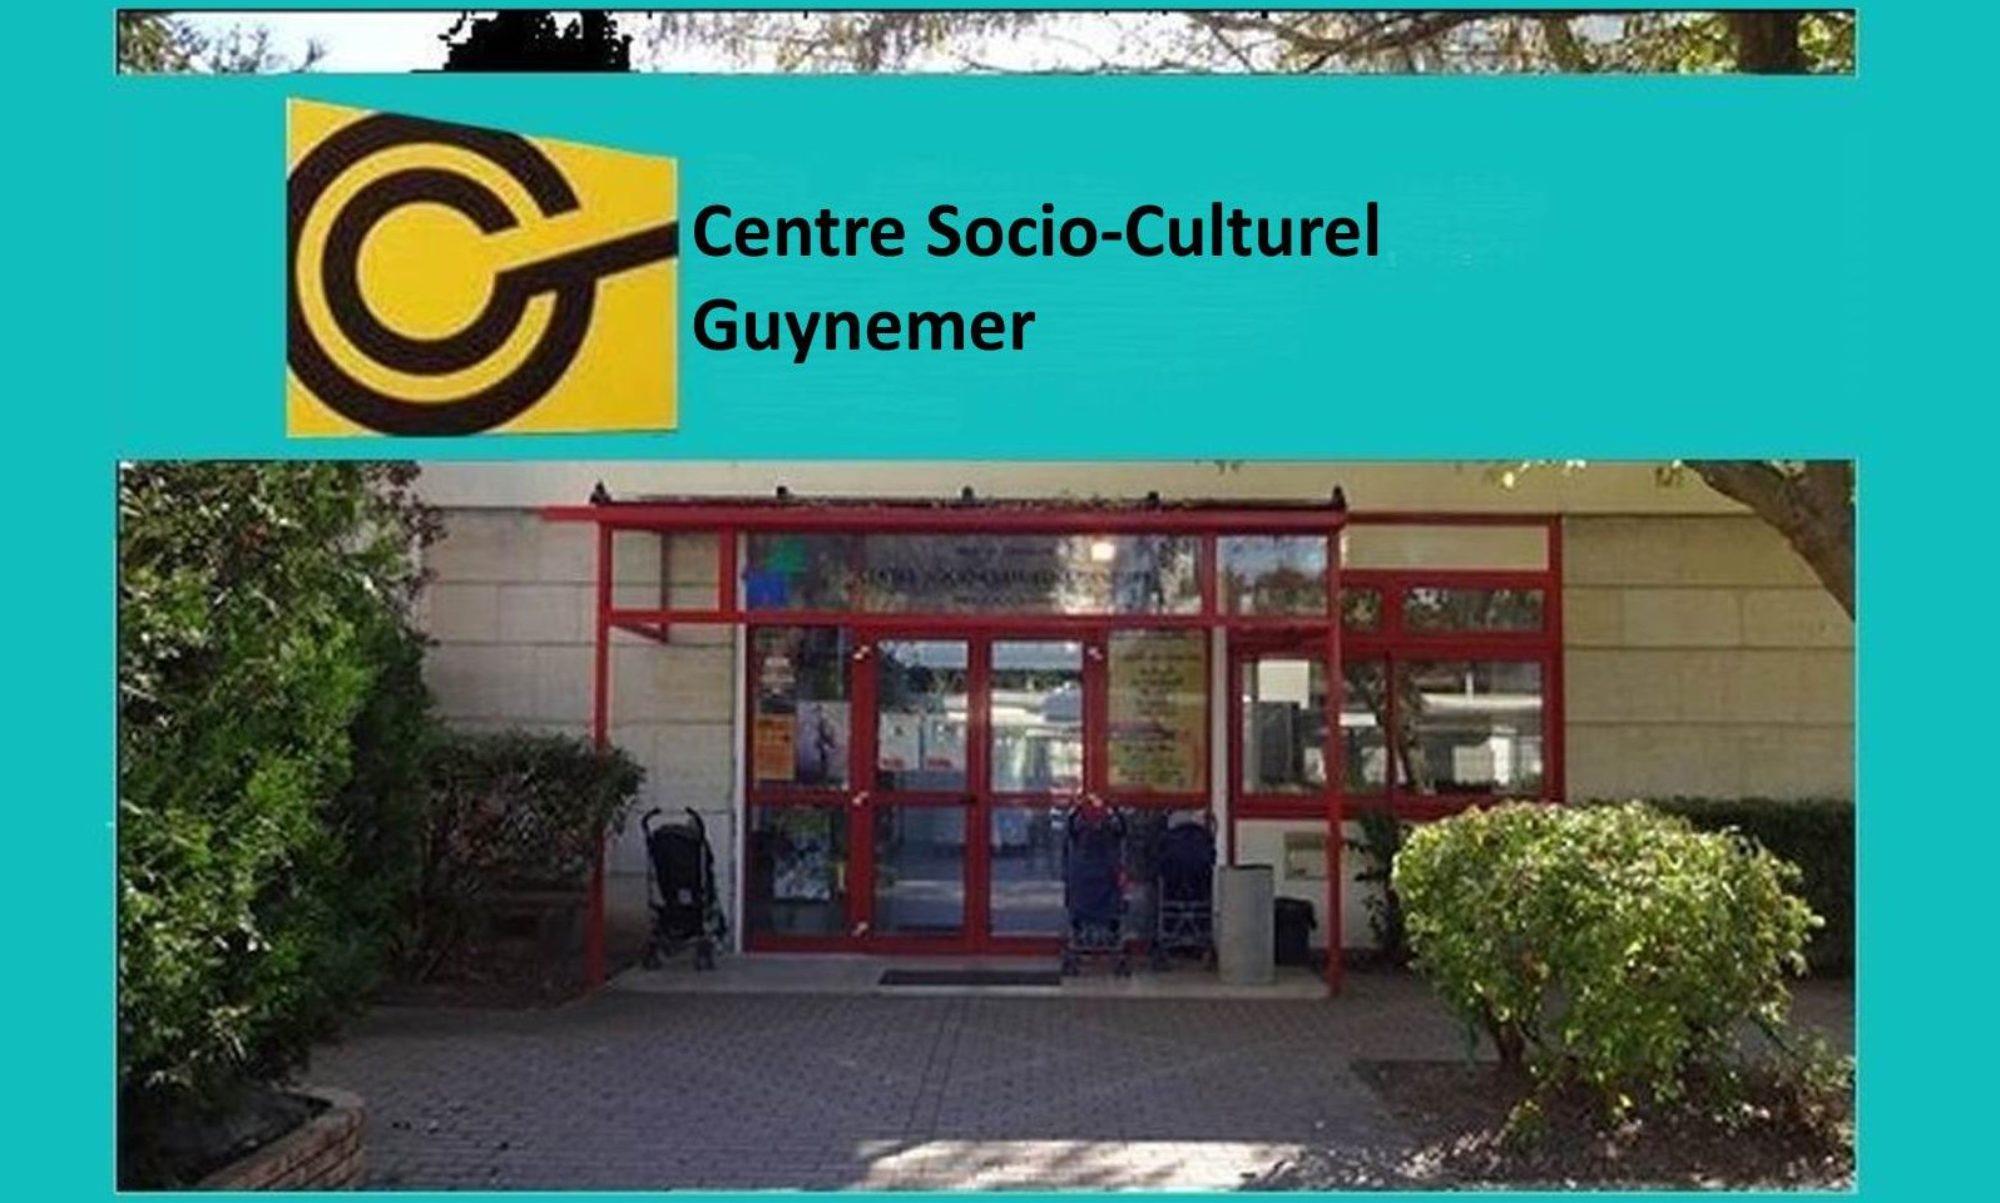 Centre Socio-culturel Guynemer